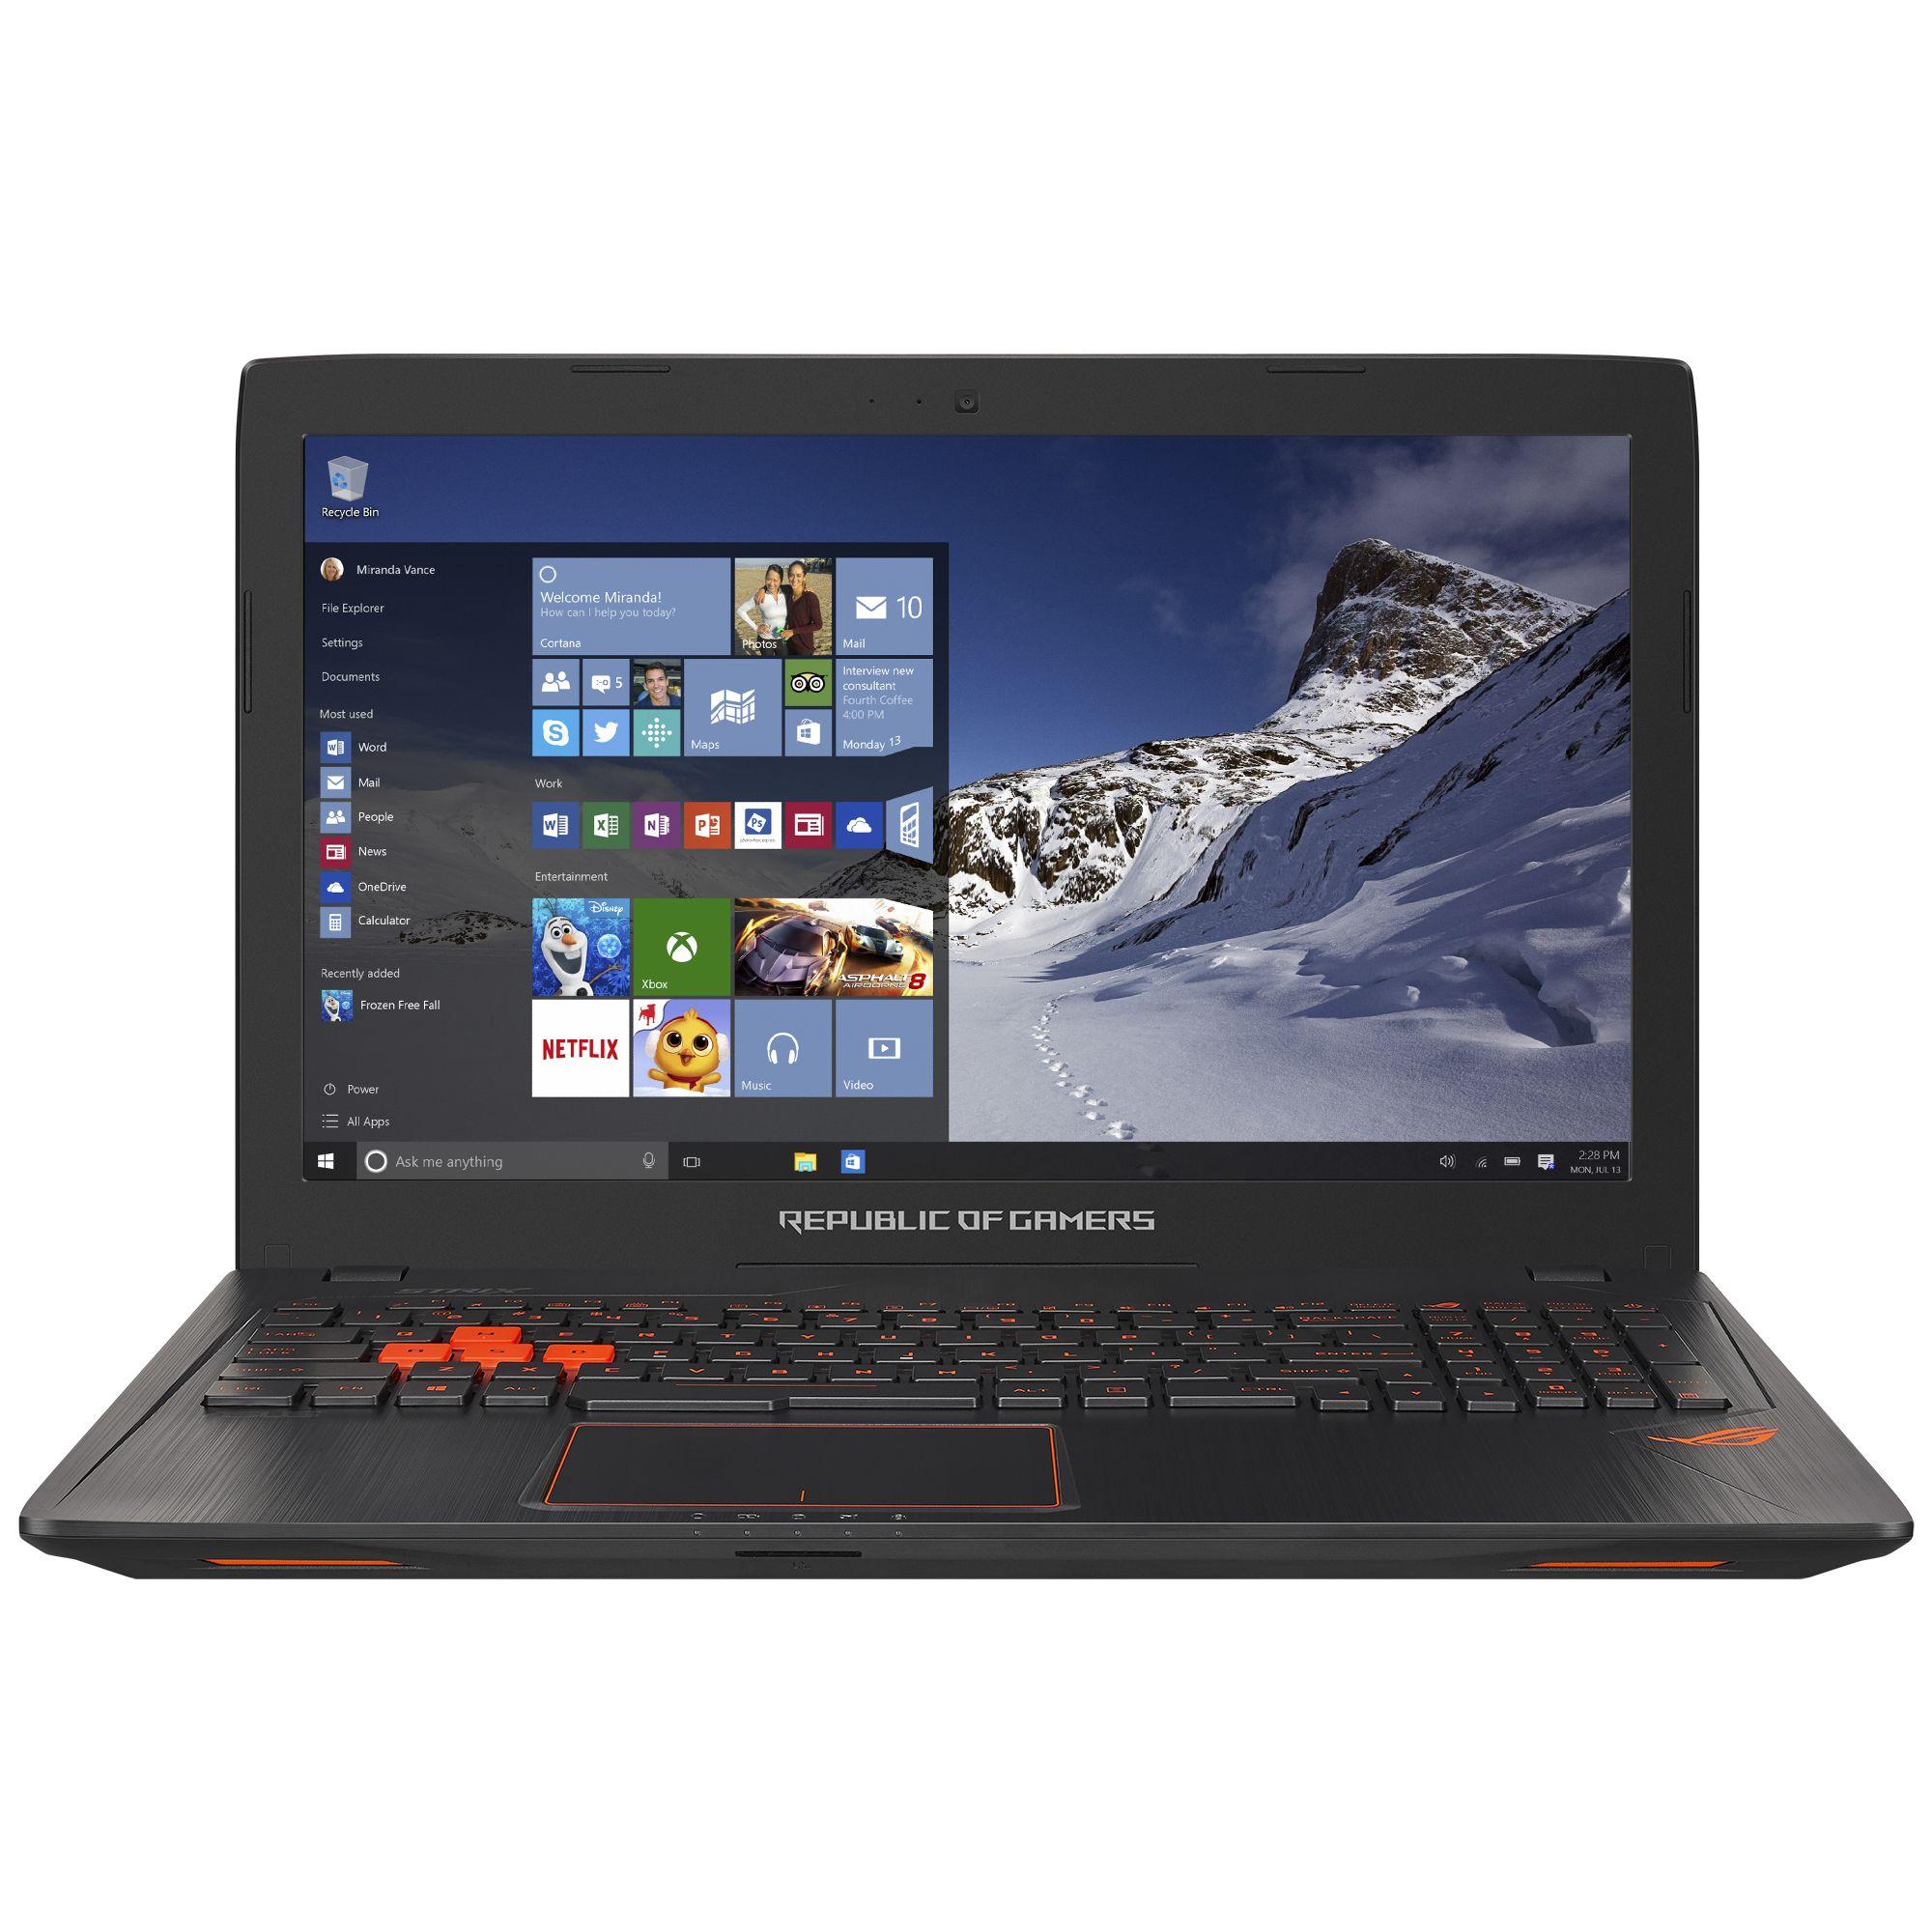 Notebook Asus ROG GL553VD 15.6 Full HD Intel Core i7-7700HQ GTX 1050-4GB RAM 8GB HDD 1TB FreeDOS